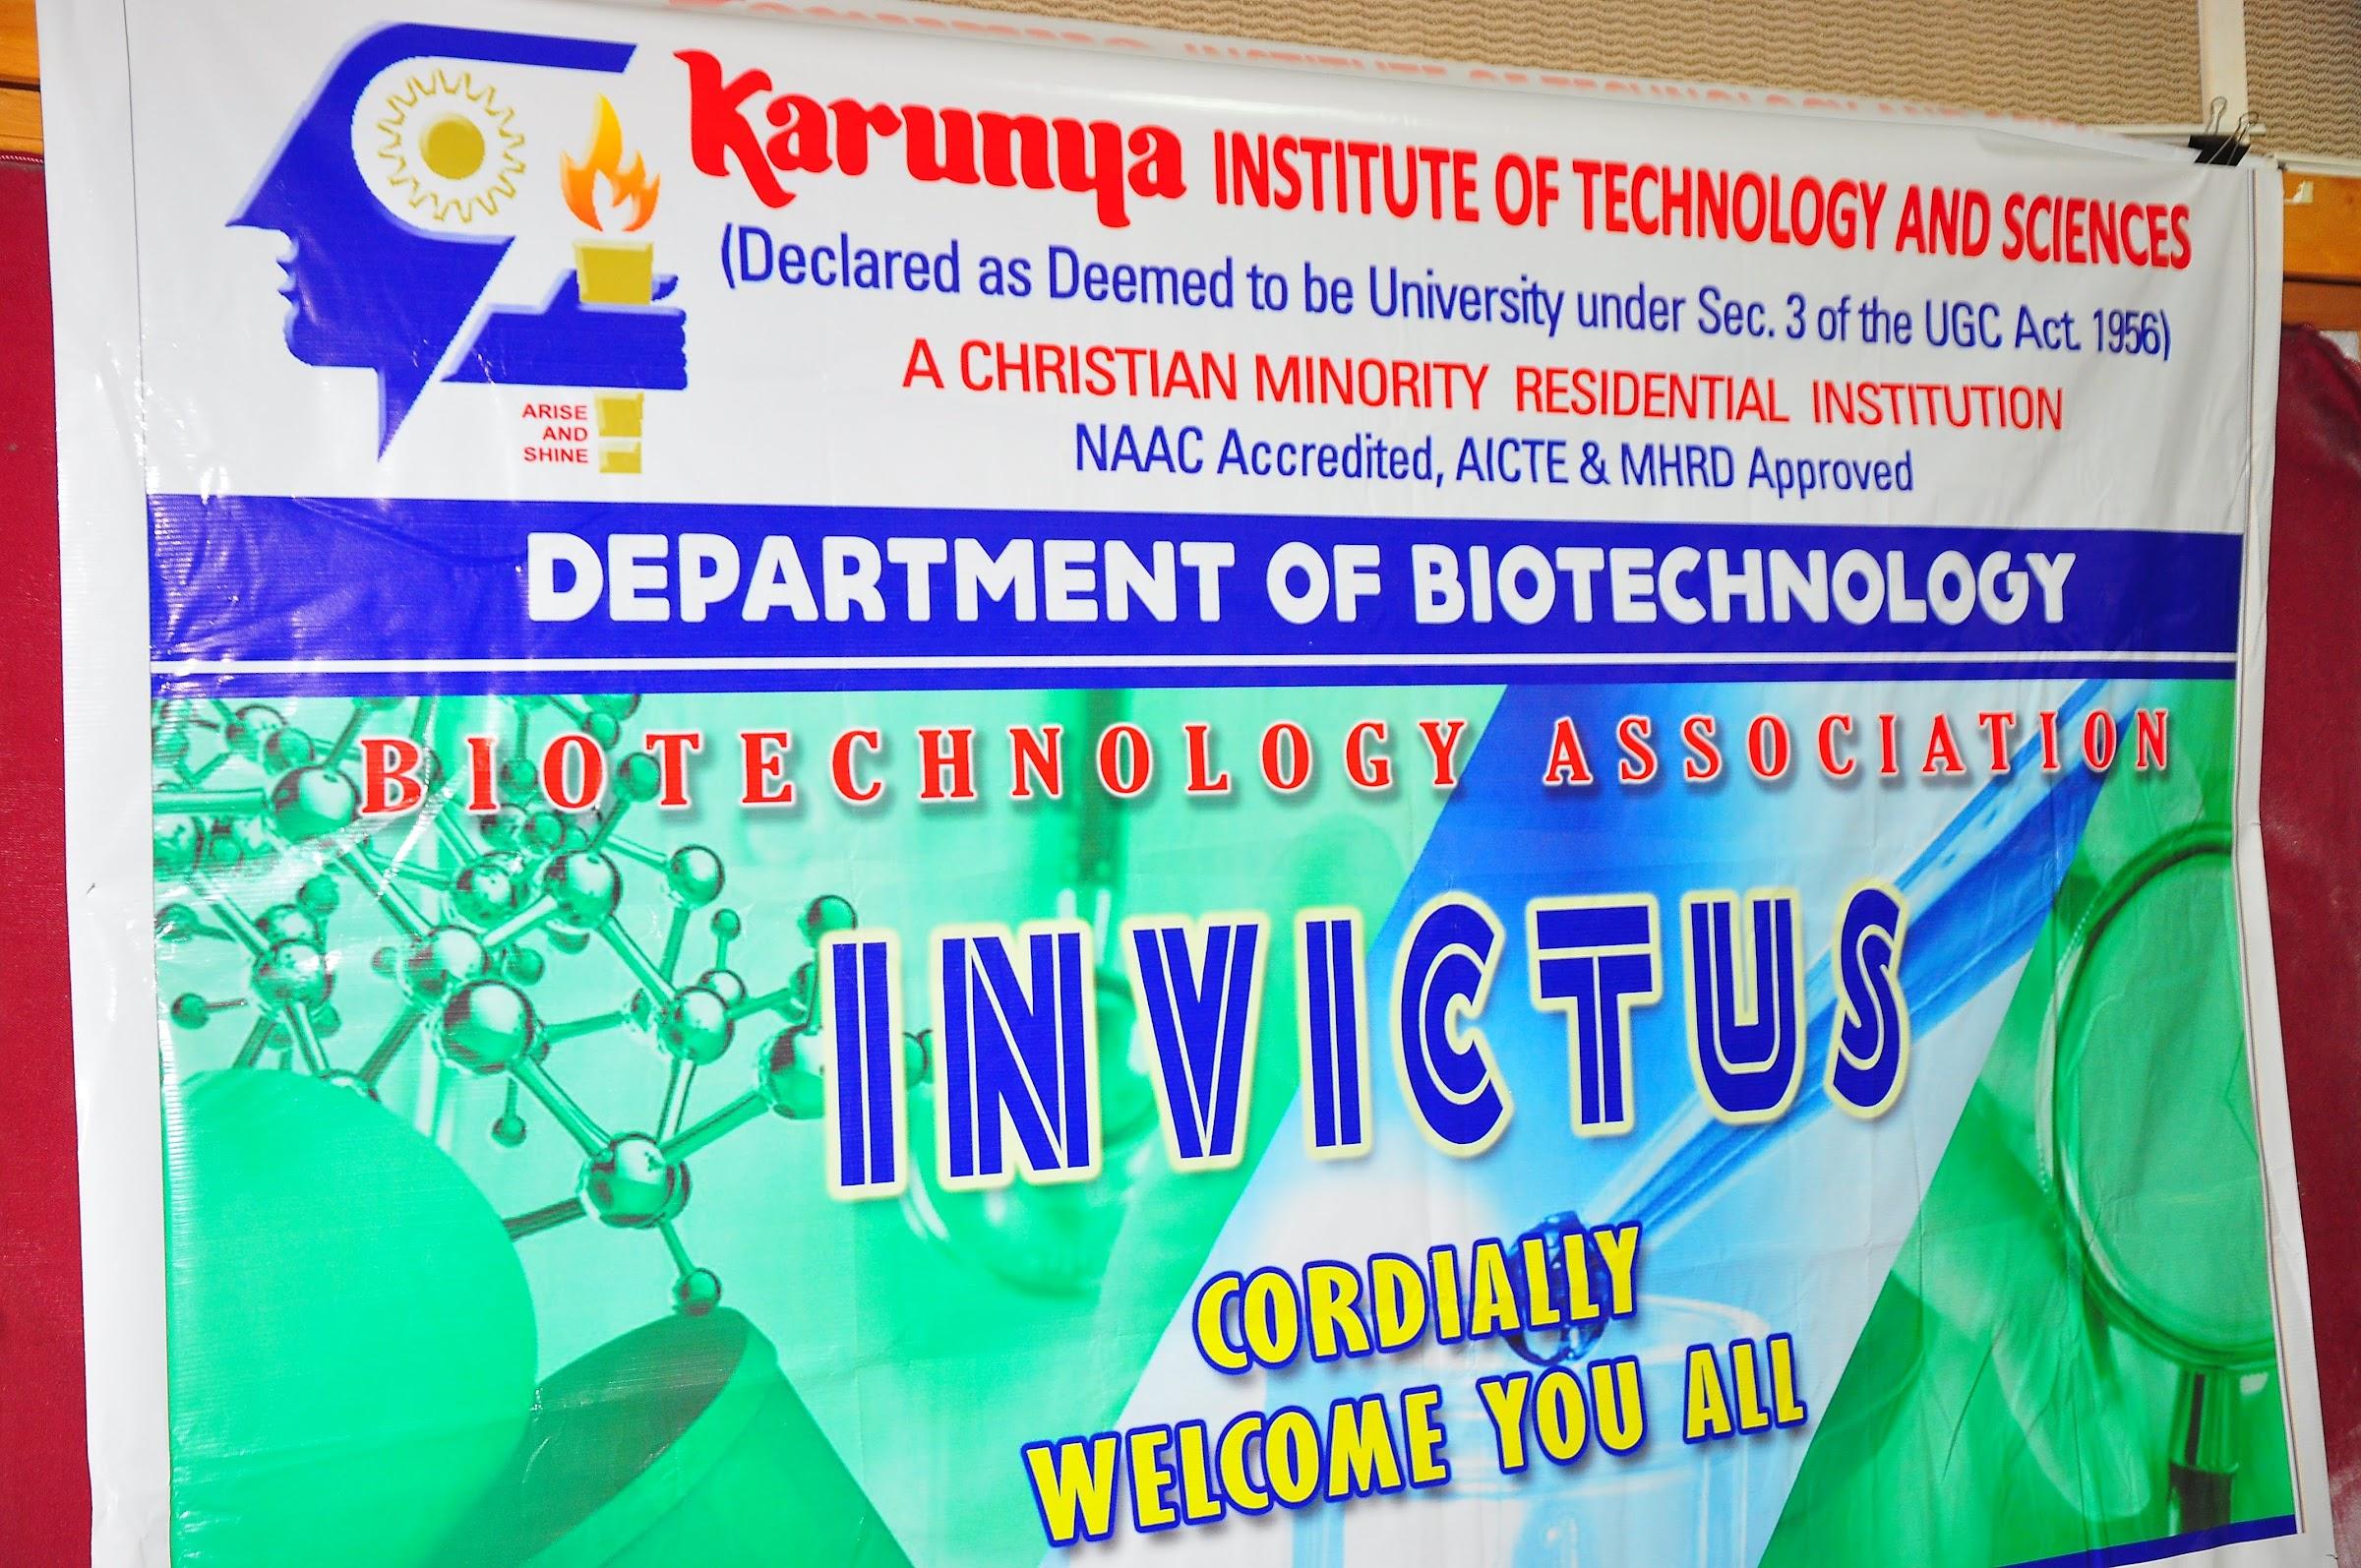 Biotech Association(VICTUS) Inauguration